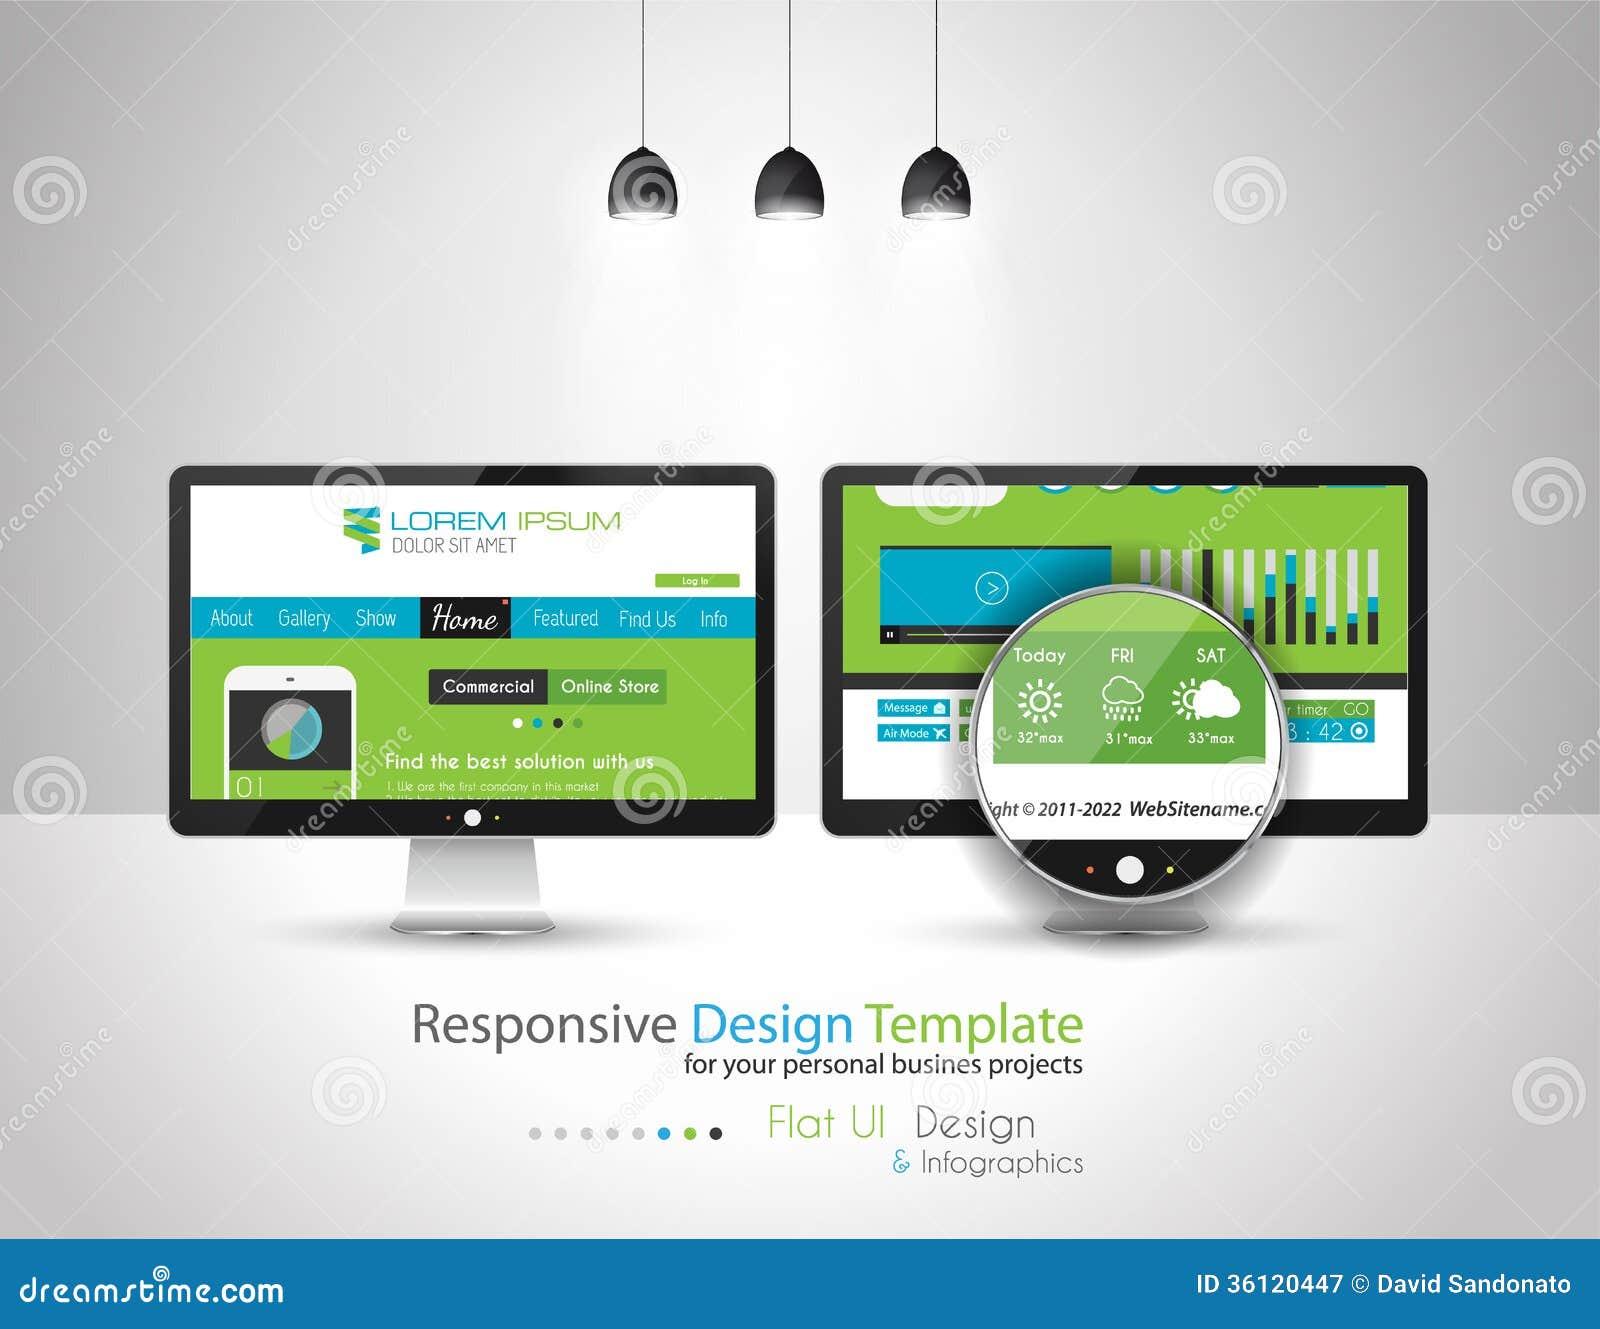 Modern Flat Style UI interface design elements